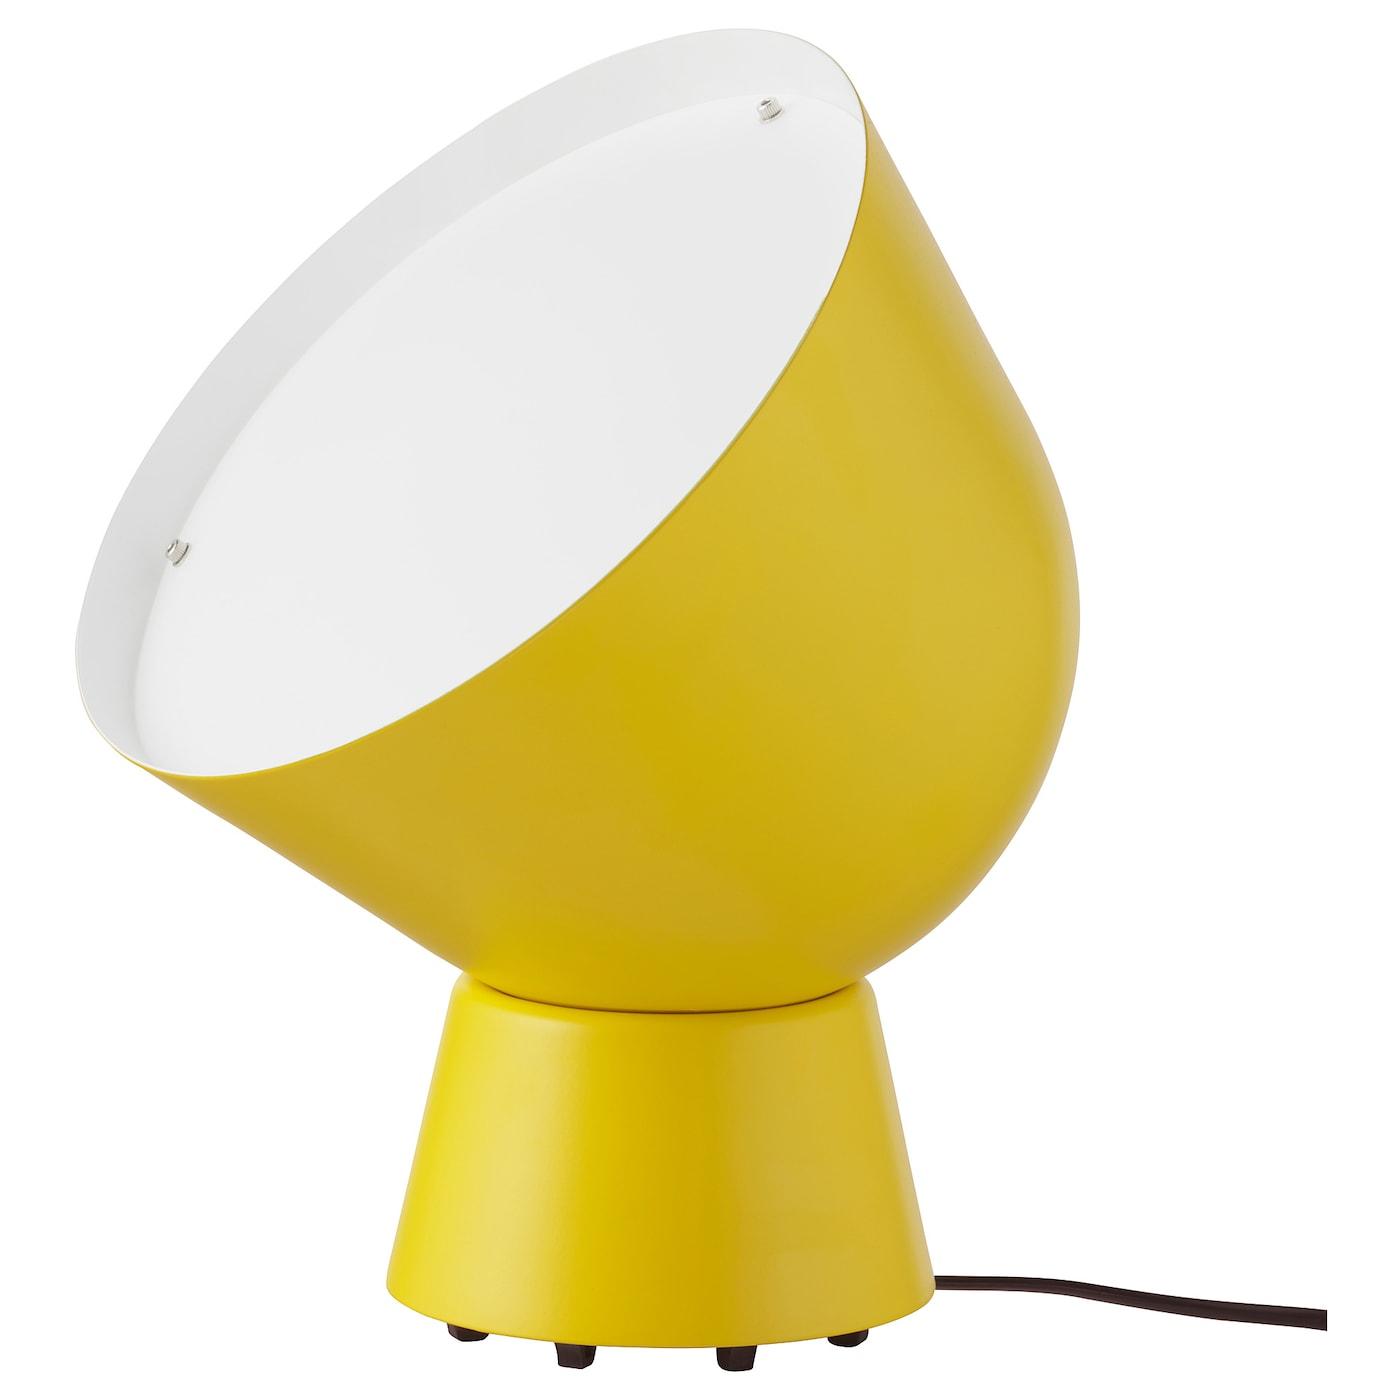 ikea ps 2017 tafellamp geel ikea. Black Bedroom Furniture Sets. Home Design Ideas